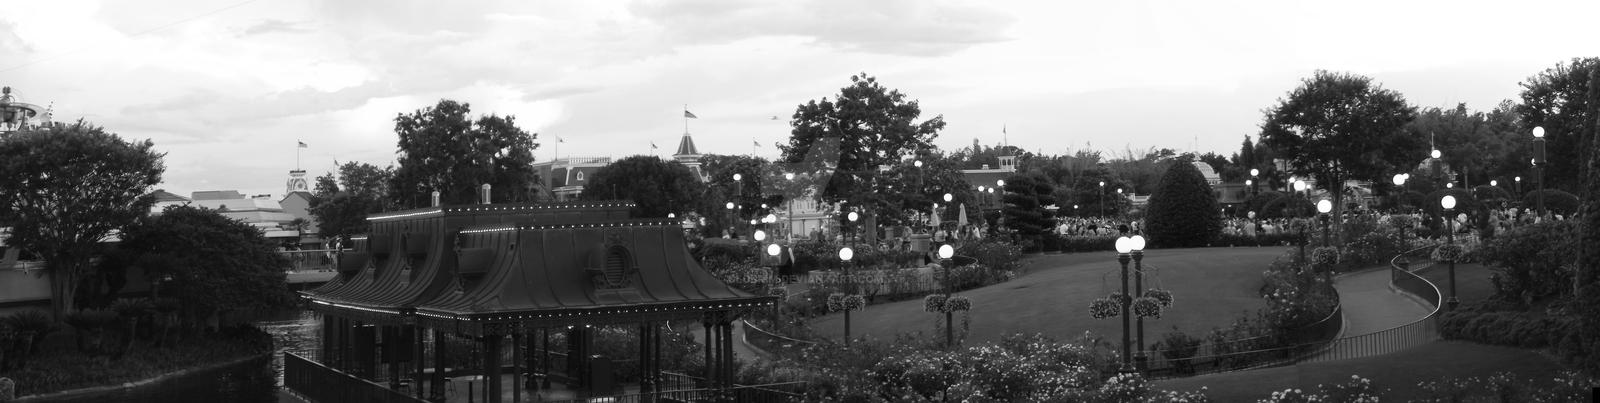 Main Street Disney by Clobrim